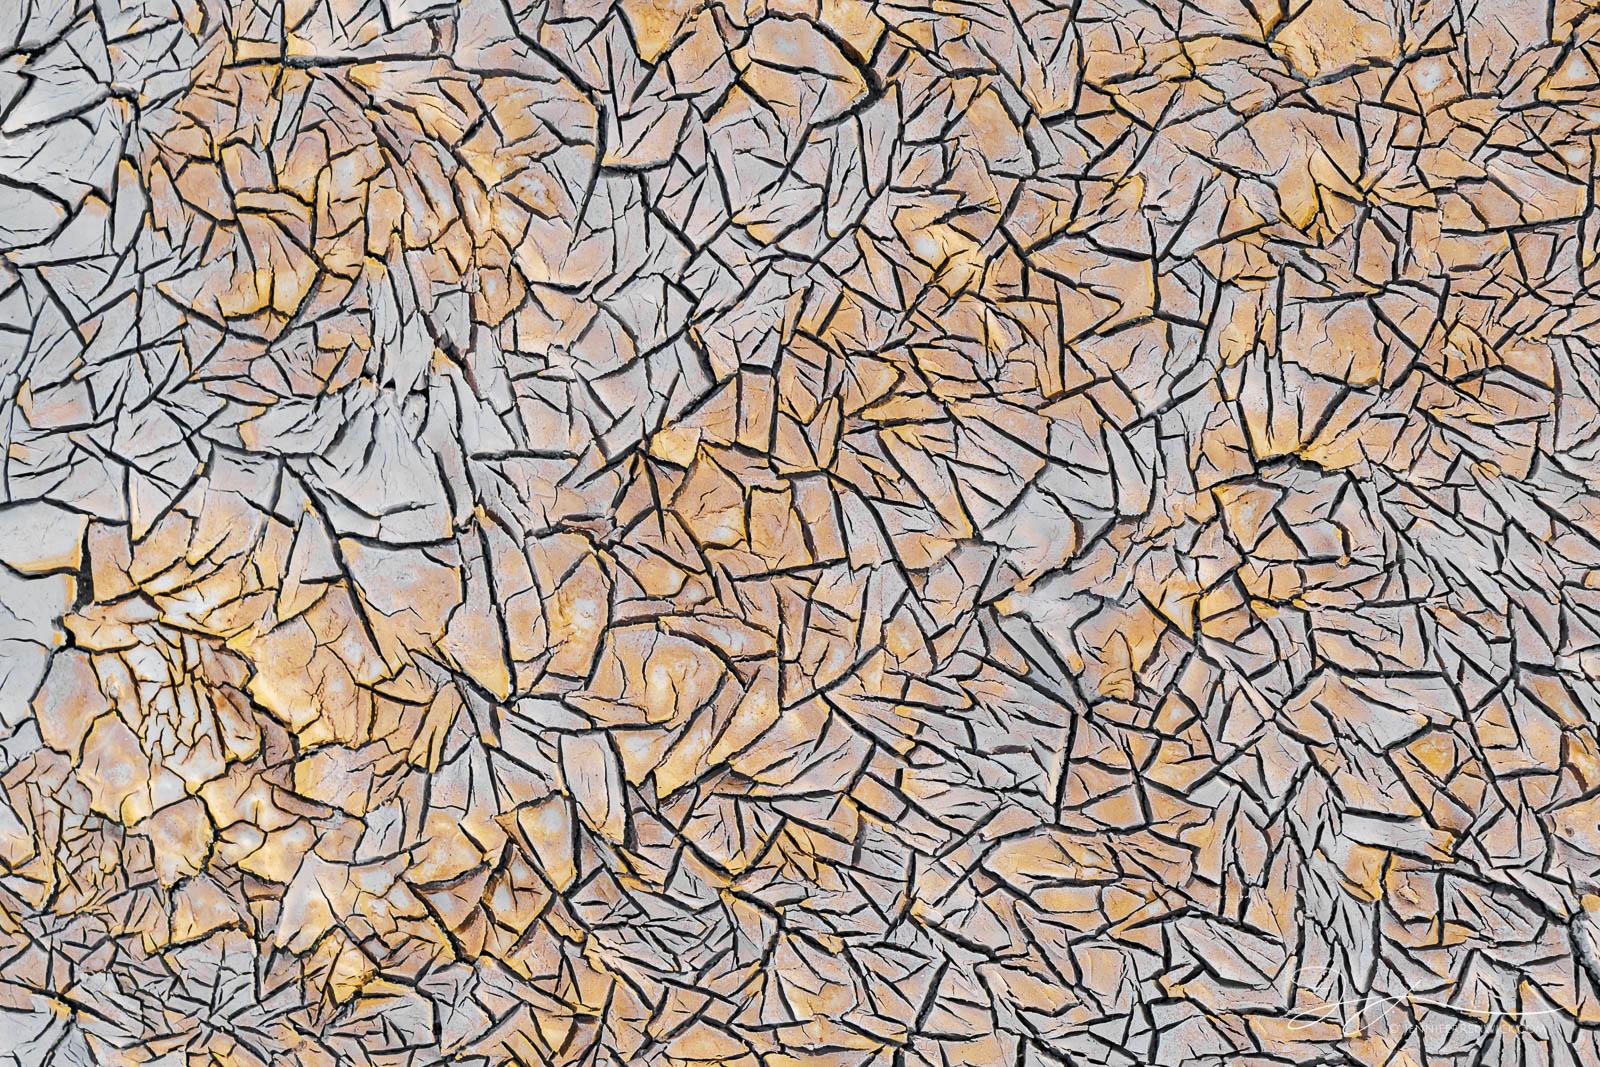 Death Valley National Park, Mojave Desert, abstract photography, California, desert, mud, textures, playa, mud cracks, patterns, photo